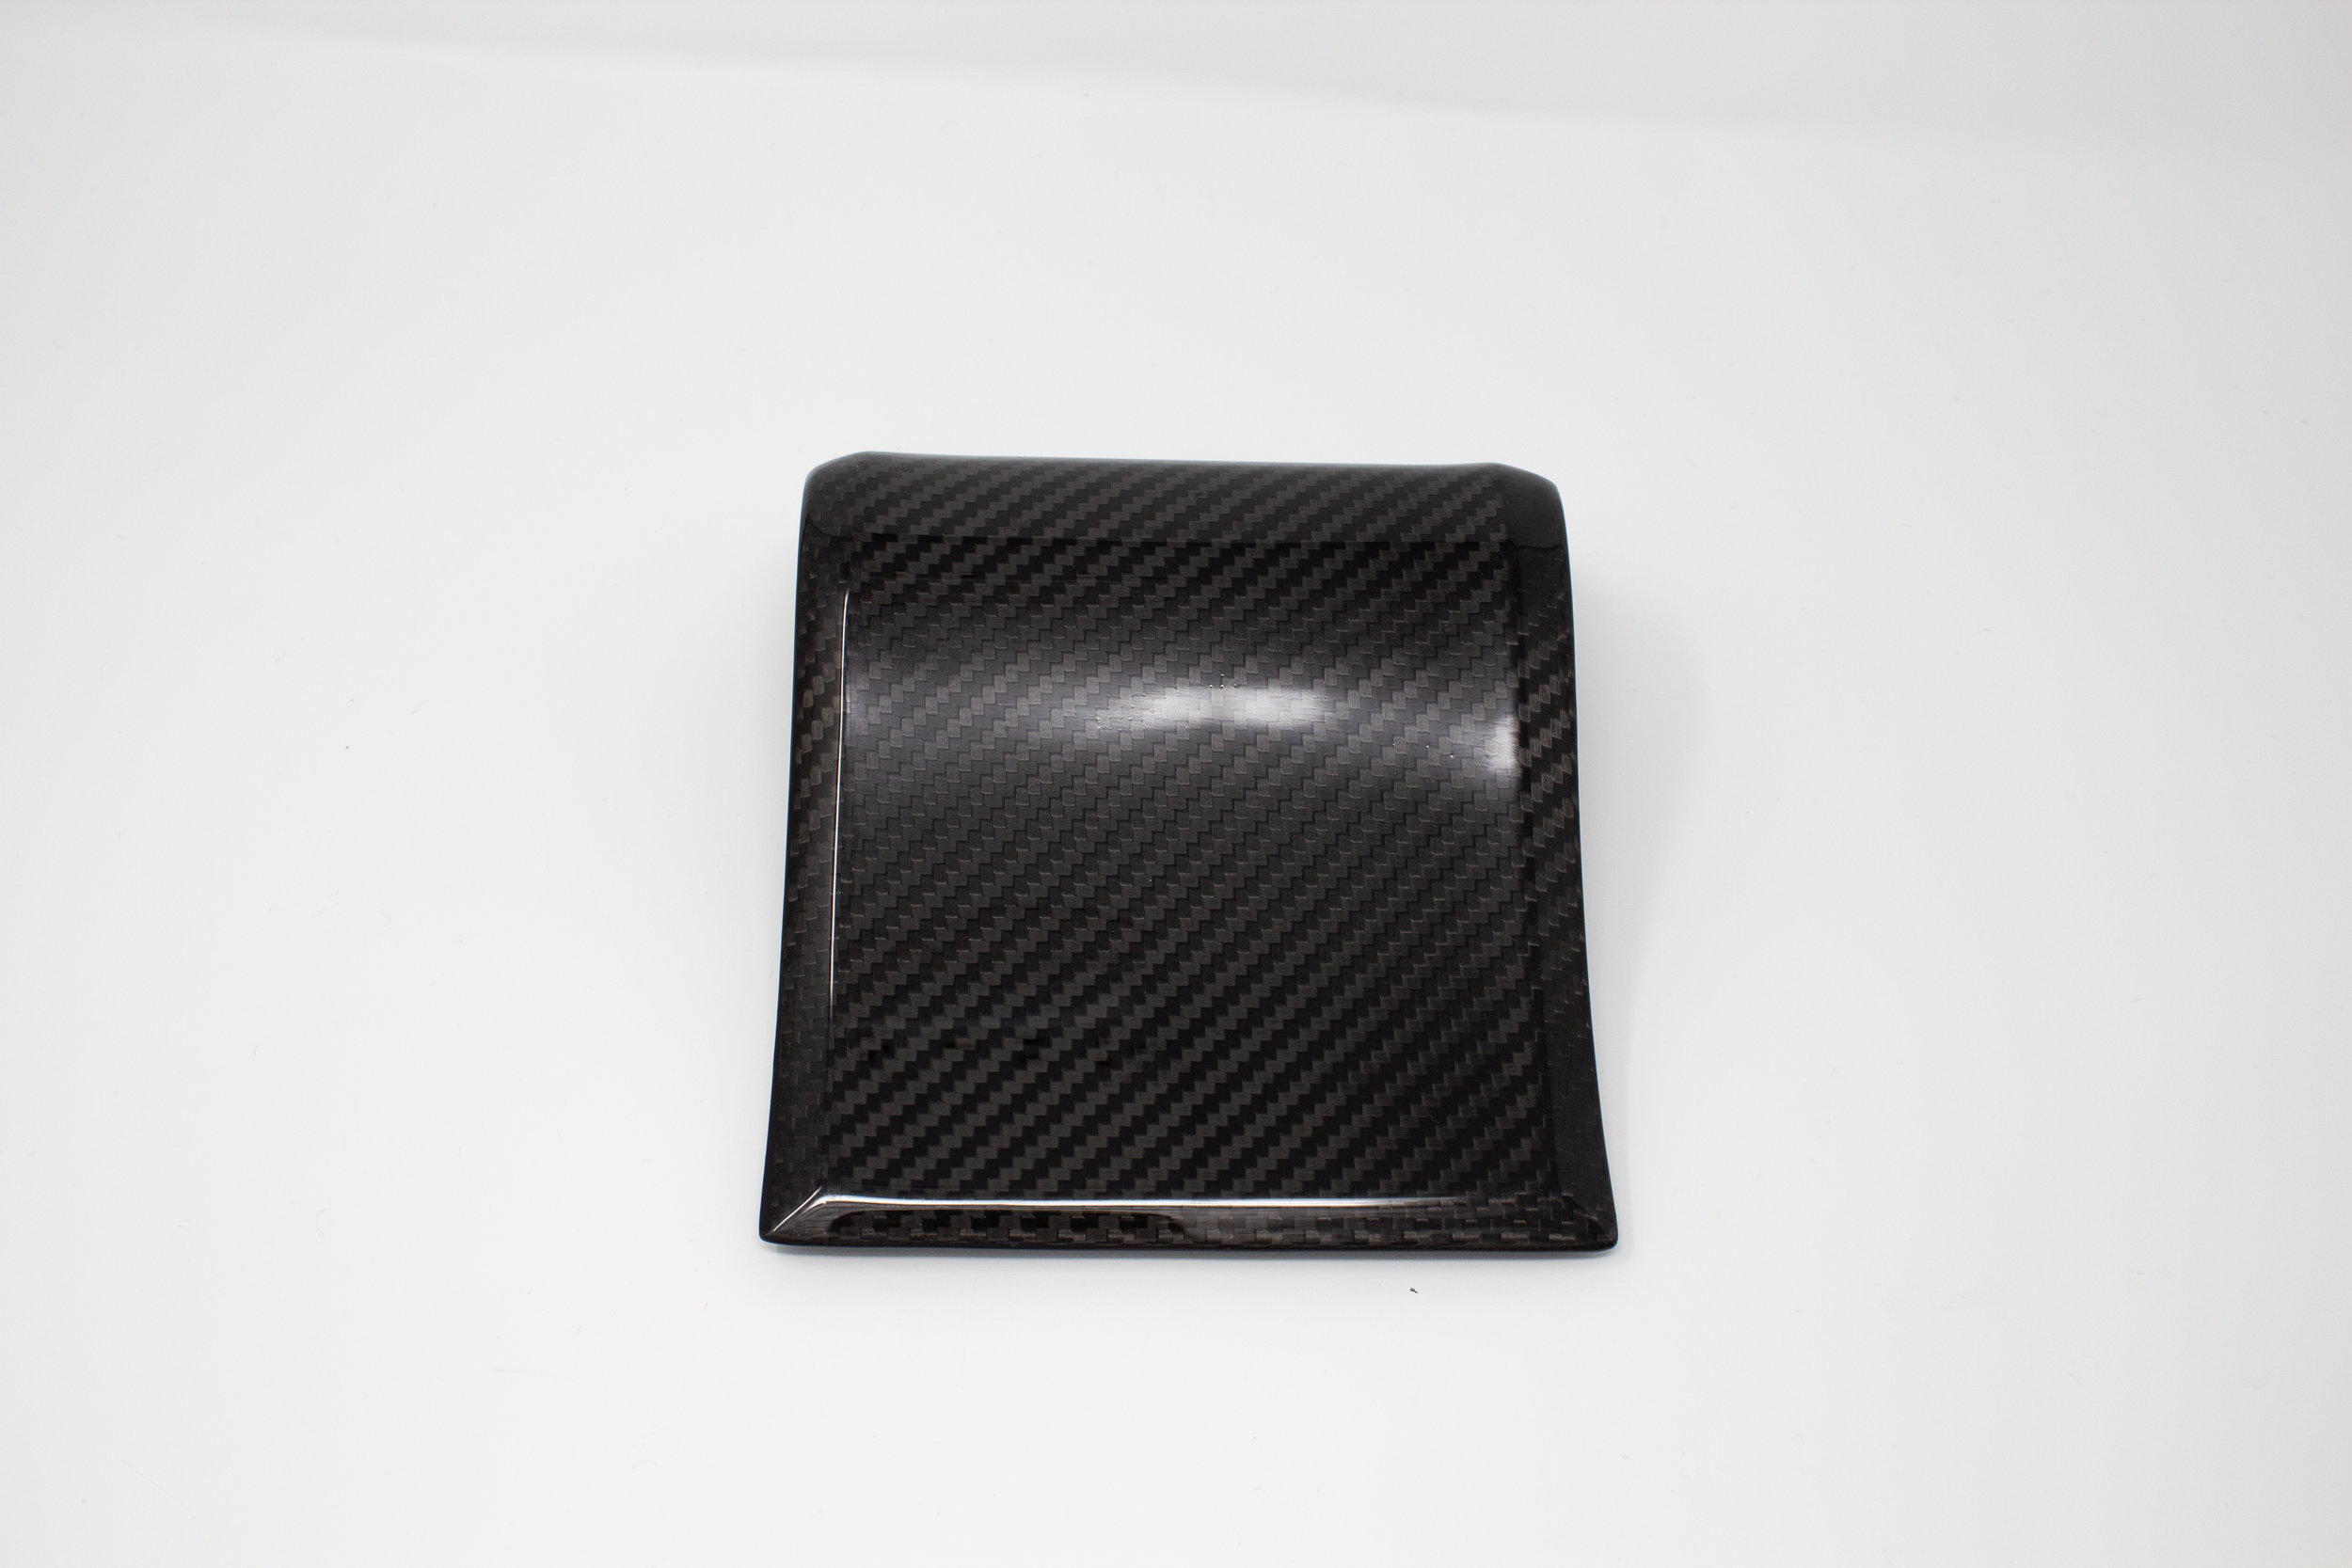 ford-carbon-fiber-door-trim-5.jpg